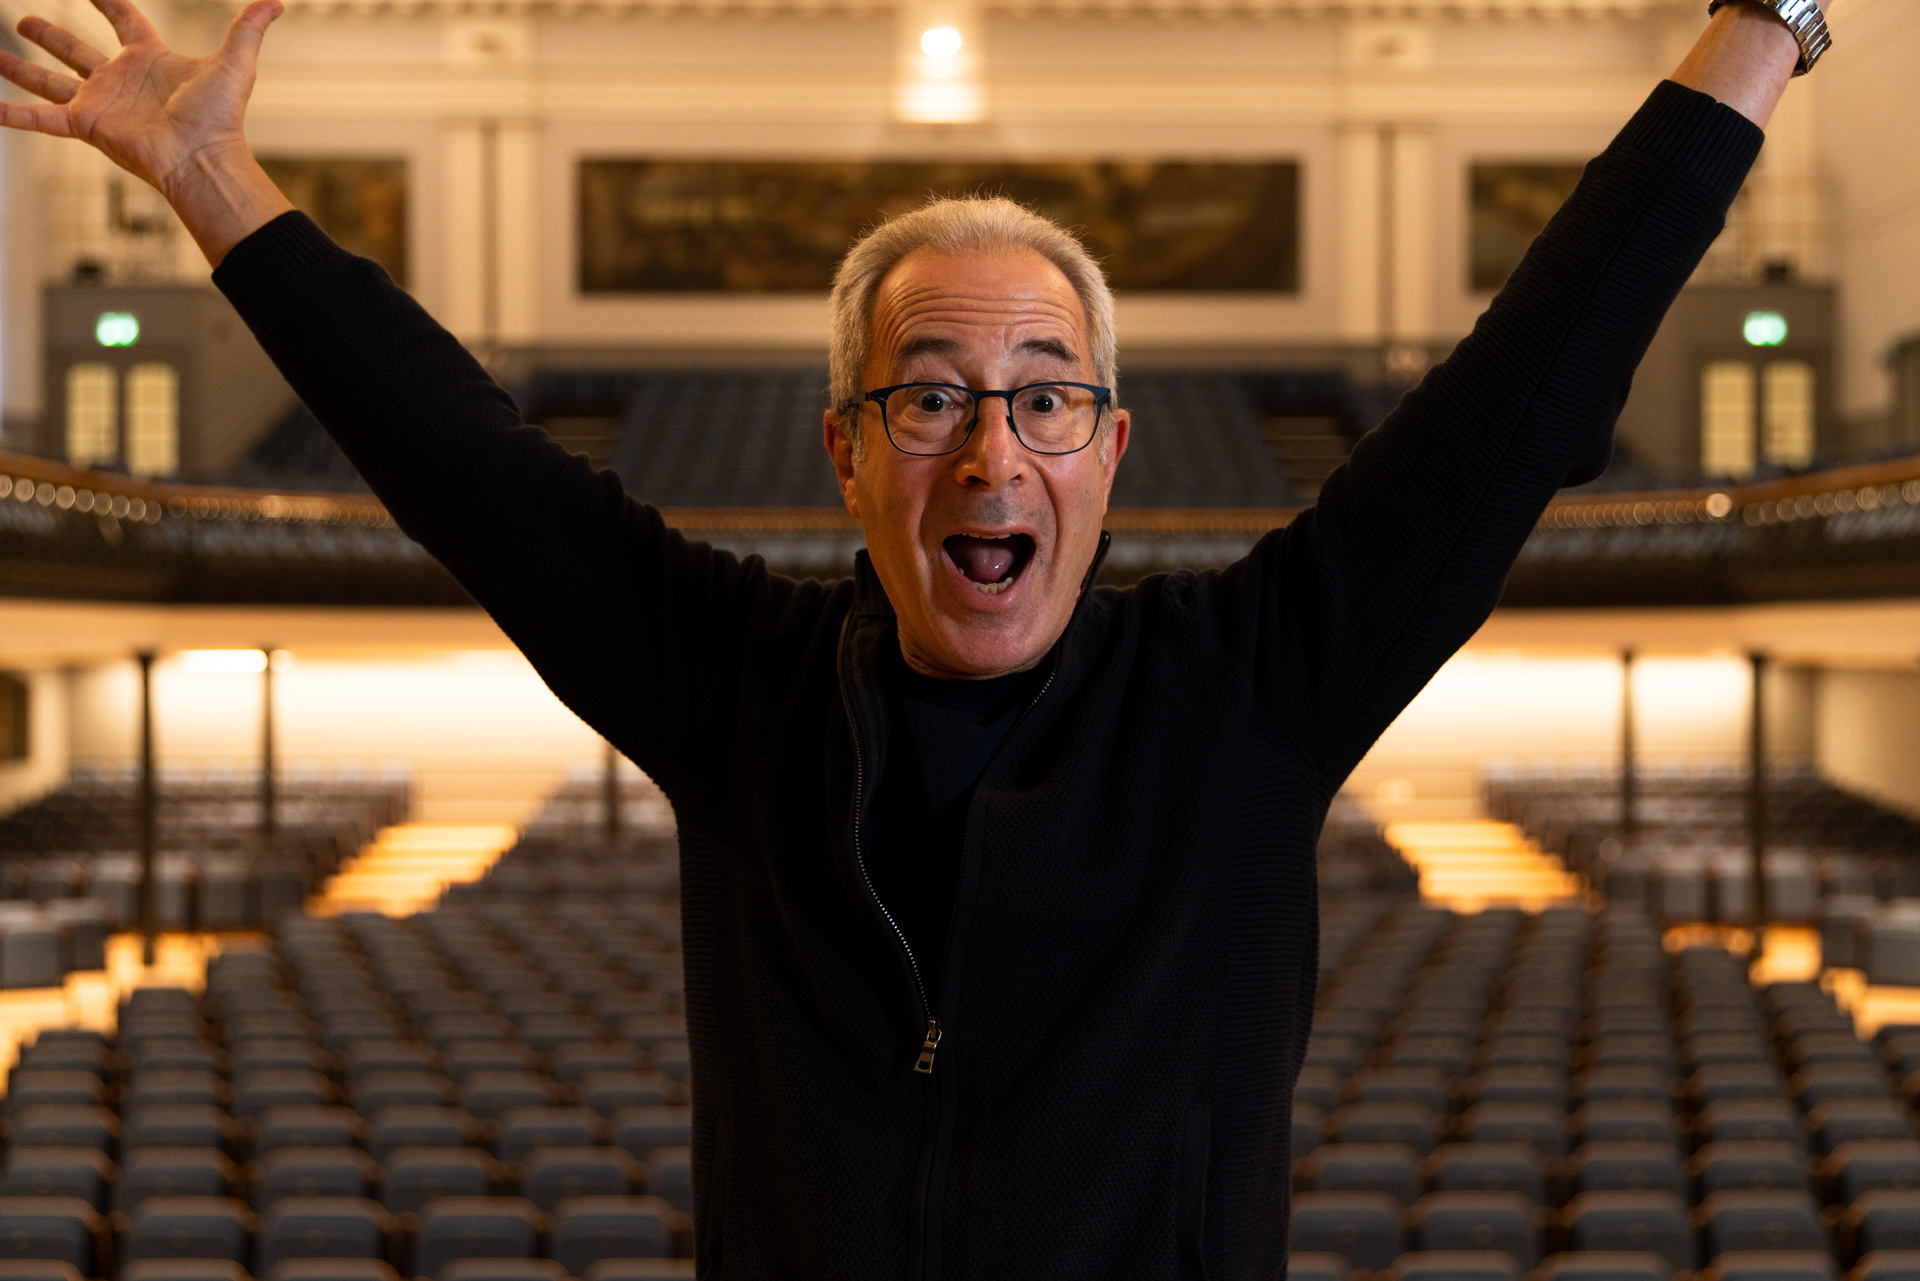 Aberdeen International Comedy Festival draws to a close